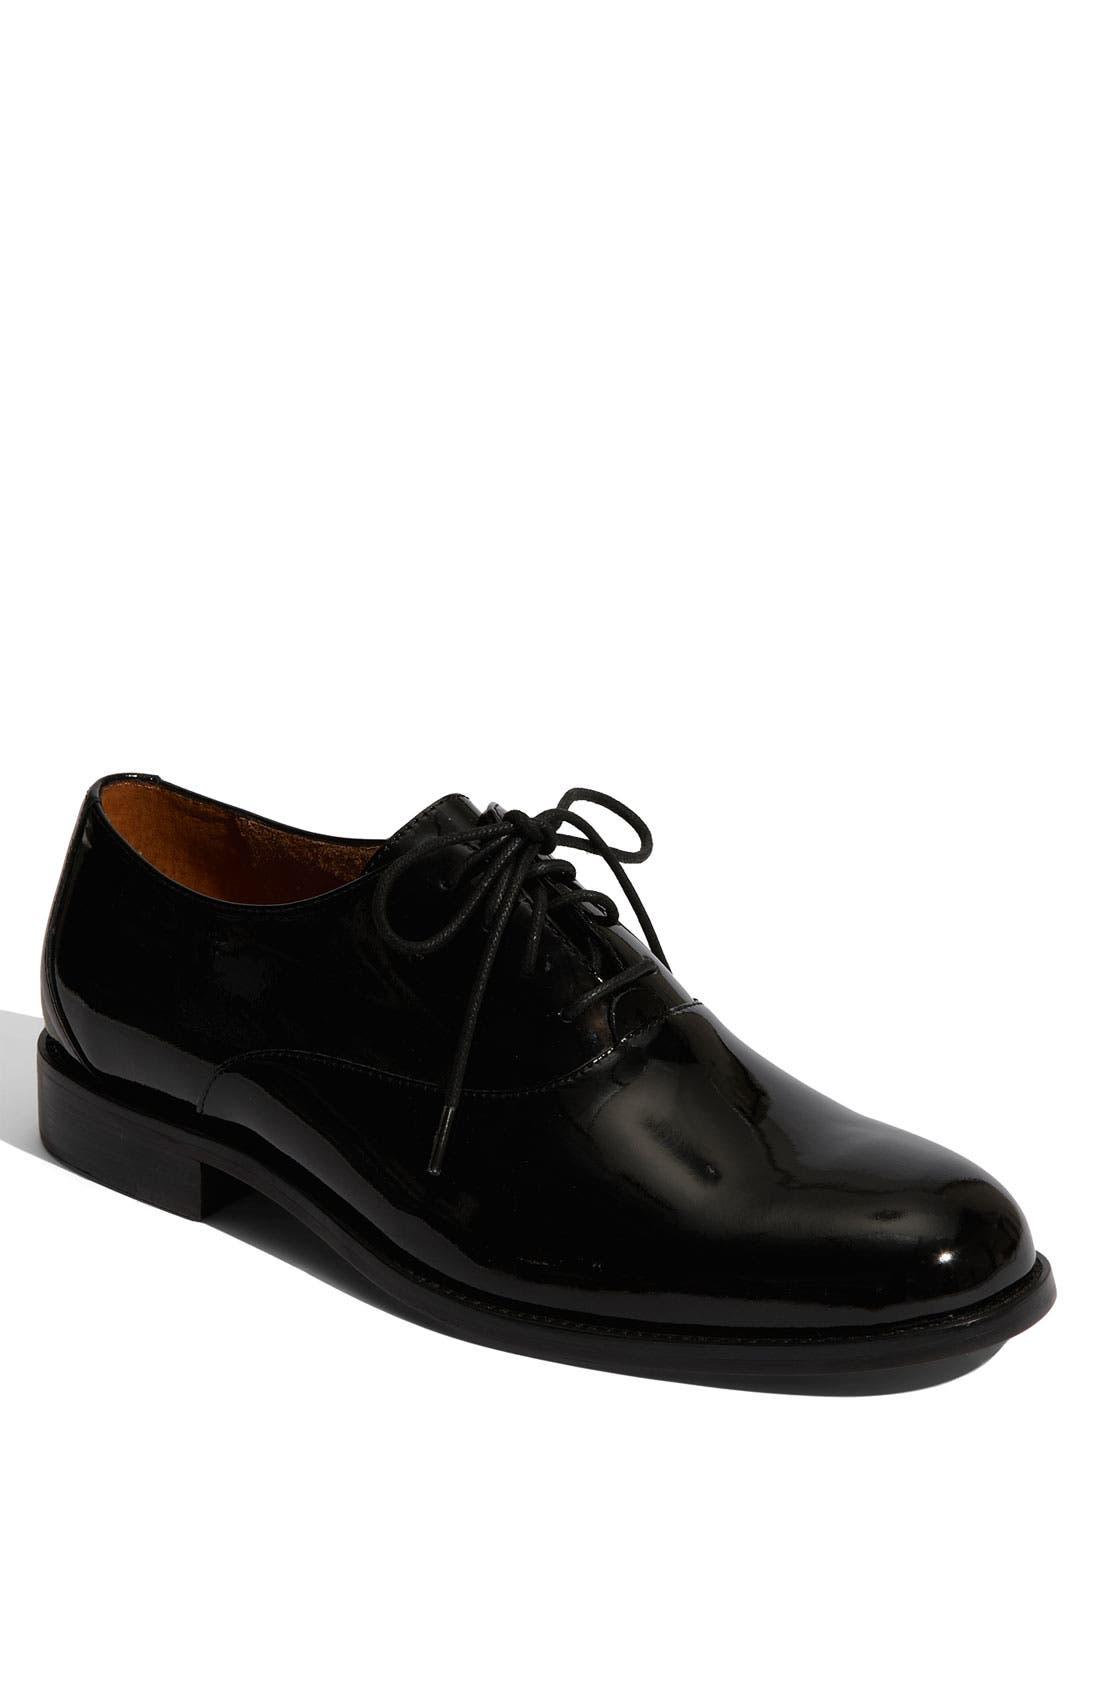 FLORSHEIM 'Kingston' Patent Leather Oxford